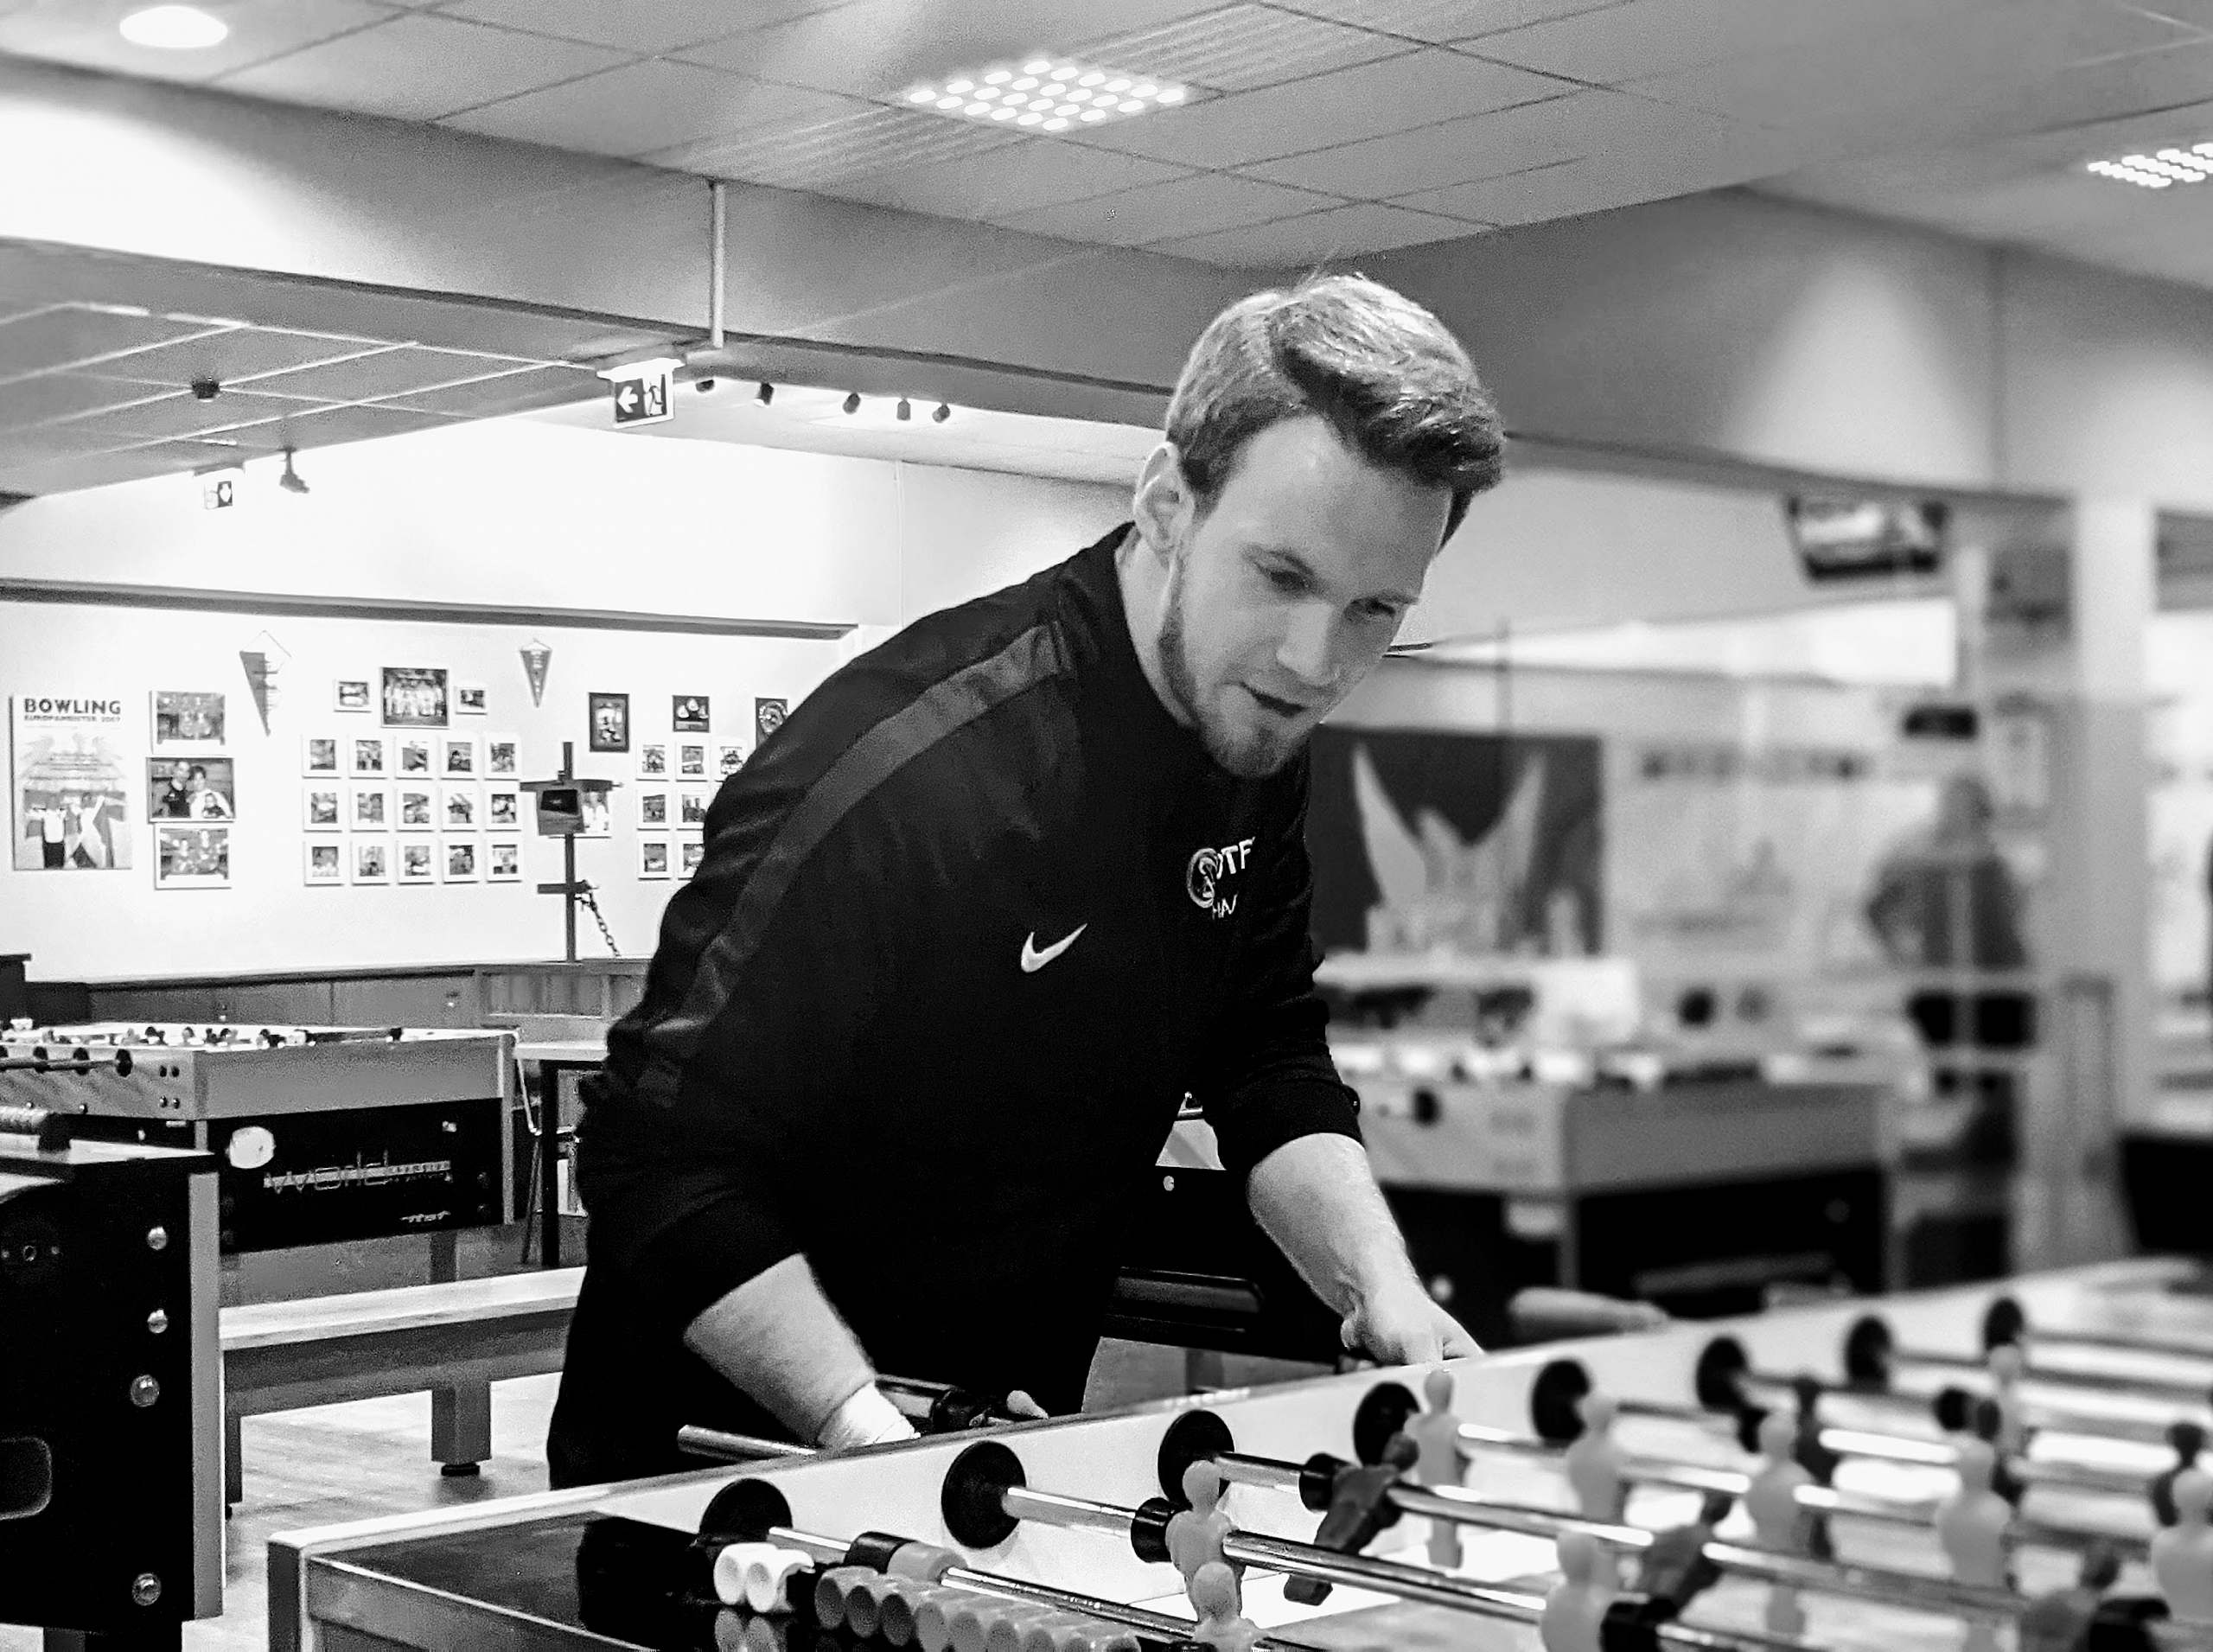 ** Training mit Weltmeister Thomas Haas am 18.08.2021 **